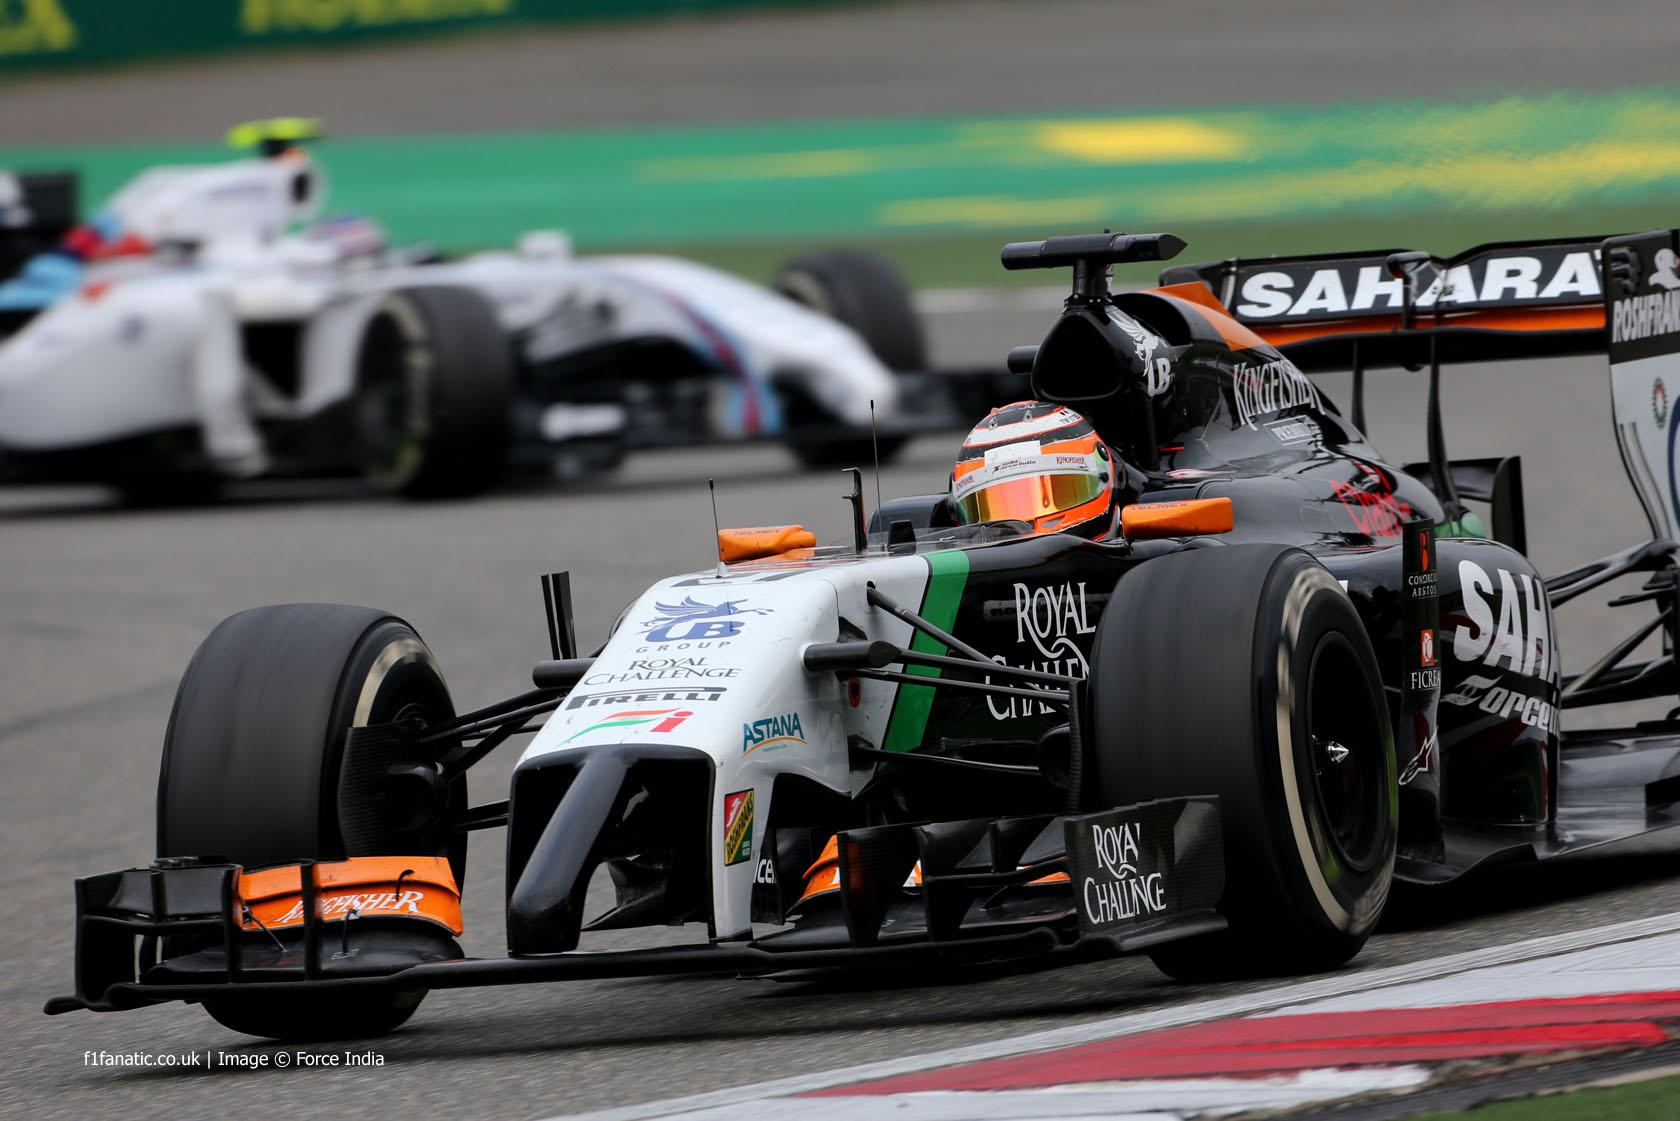 Nico Hulkenberg, Force India, Shanghai International Circuit, 2014